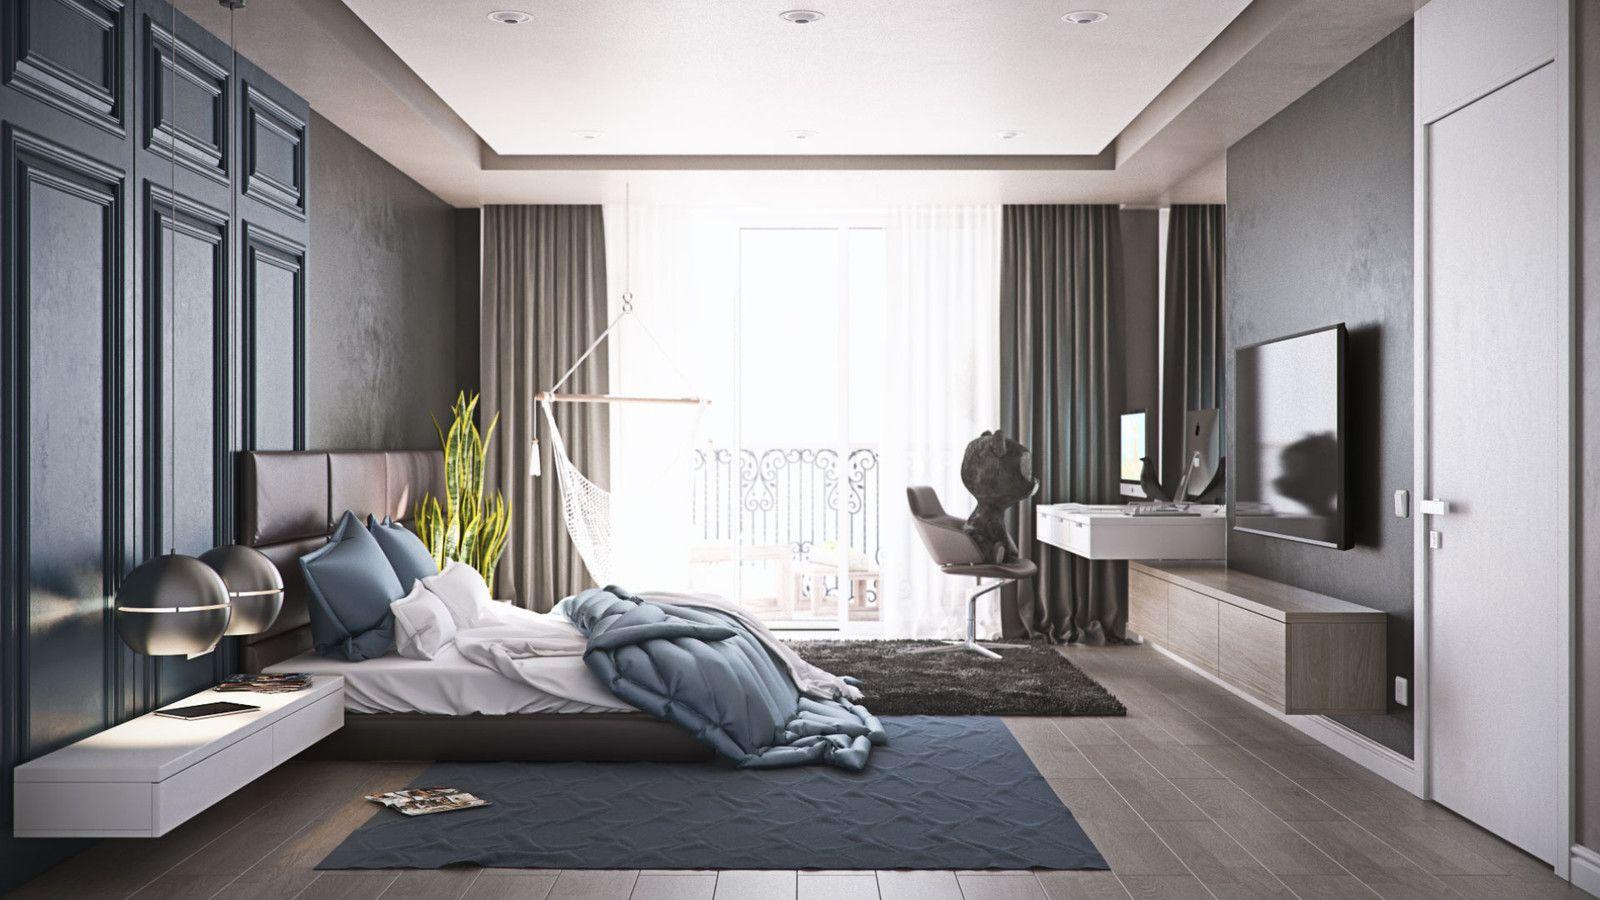 10*10 bedroom interior kid room  black oak  musa studio  architecture and interior